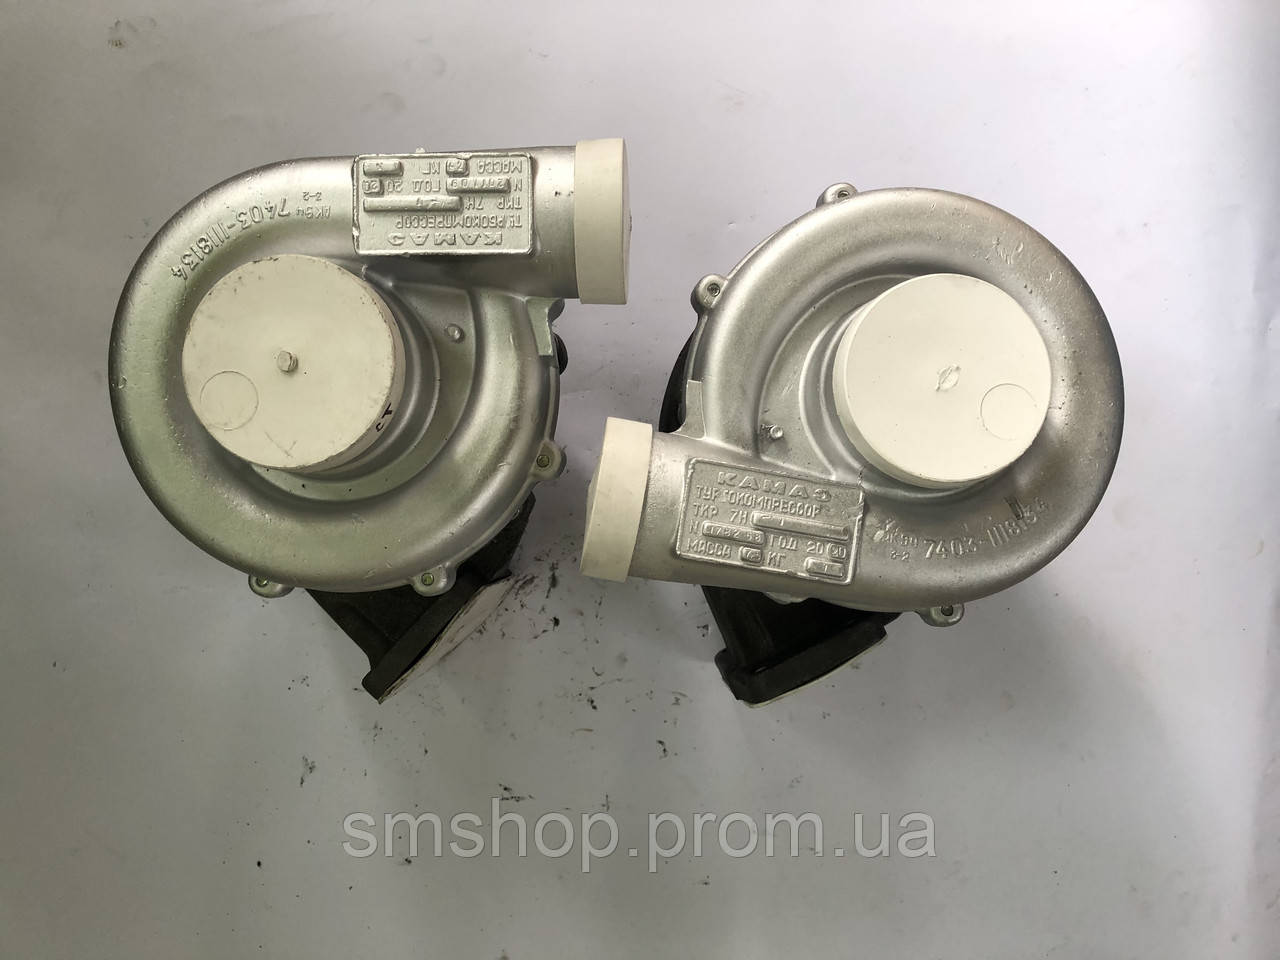 Турбокомпрессор (турбина) ТКР-7Н